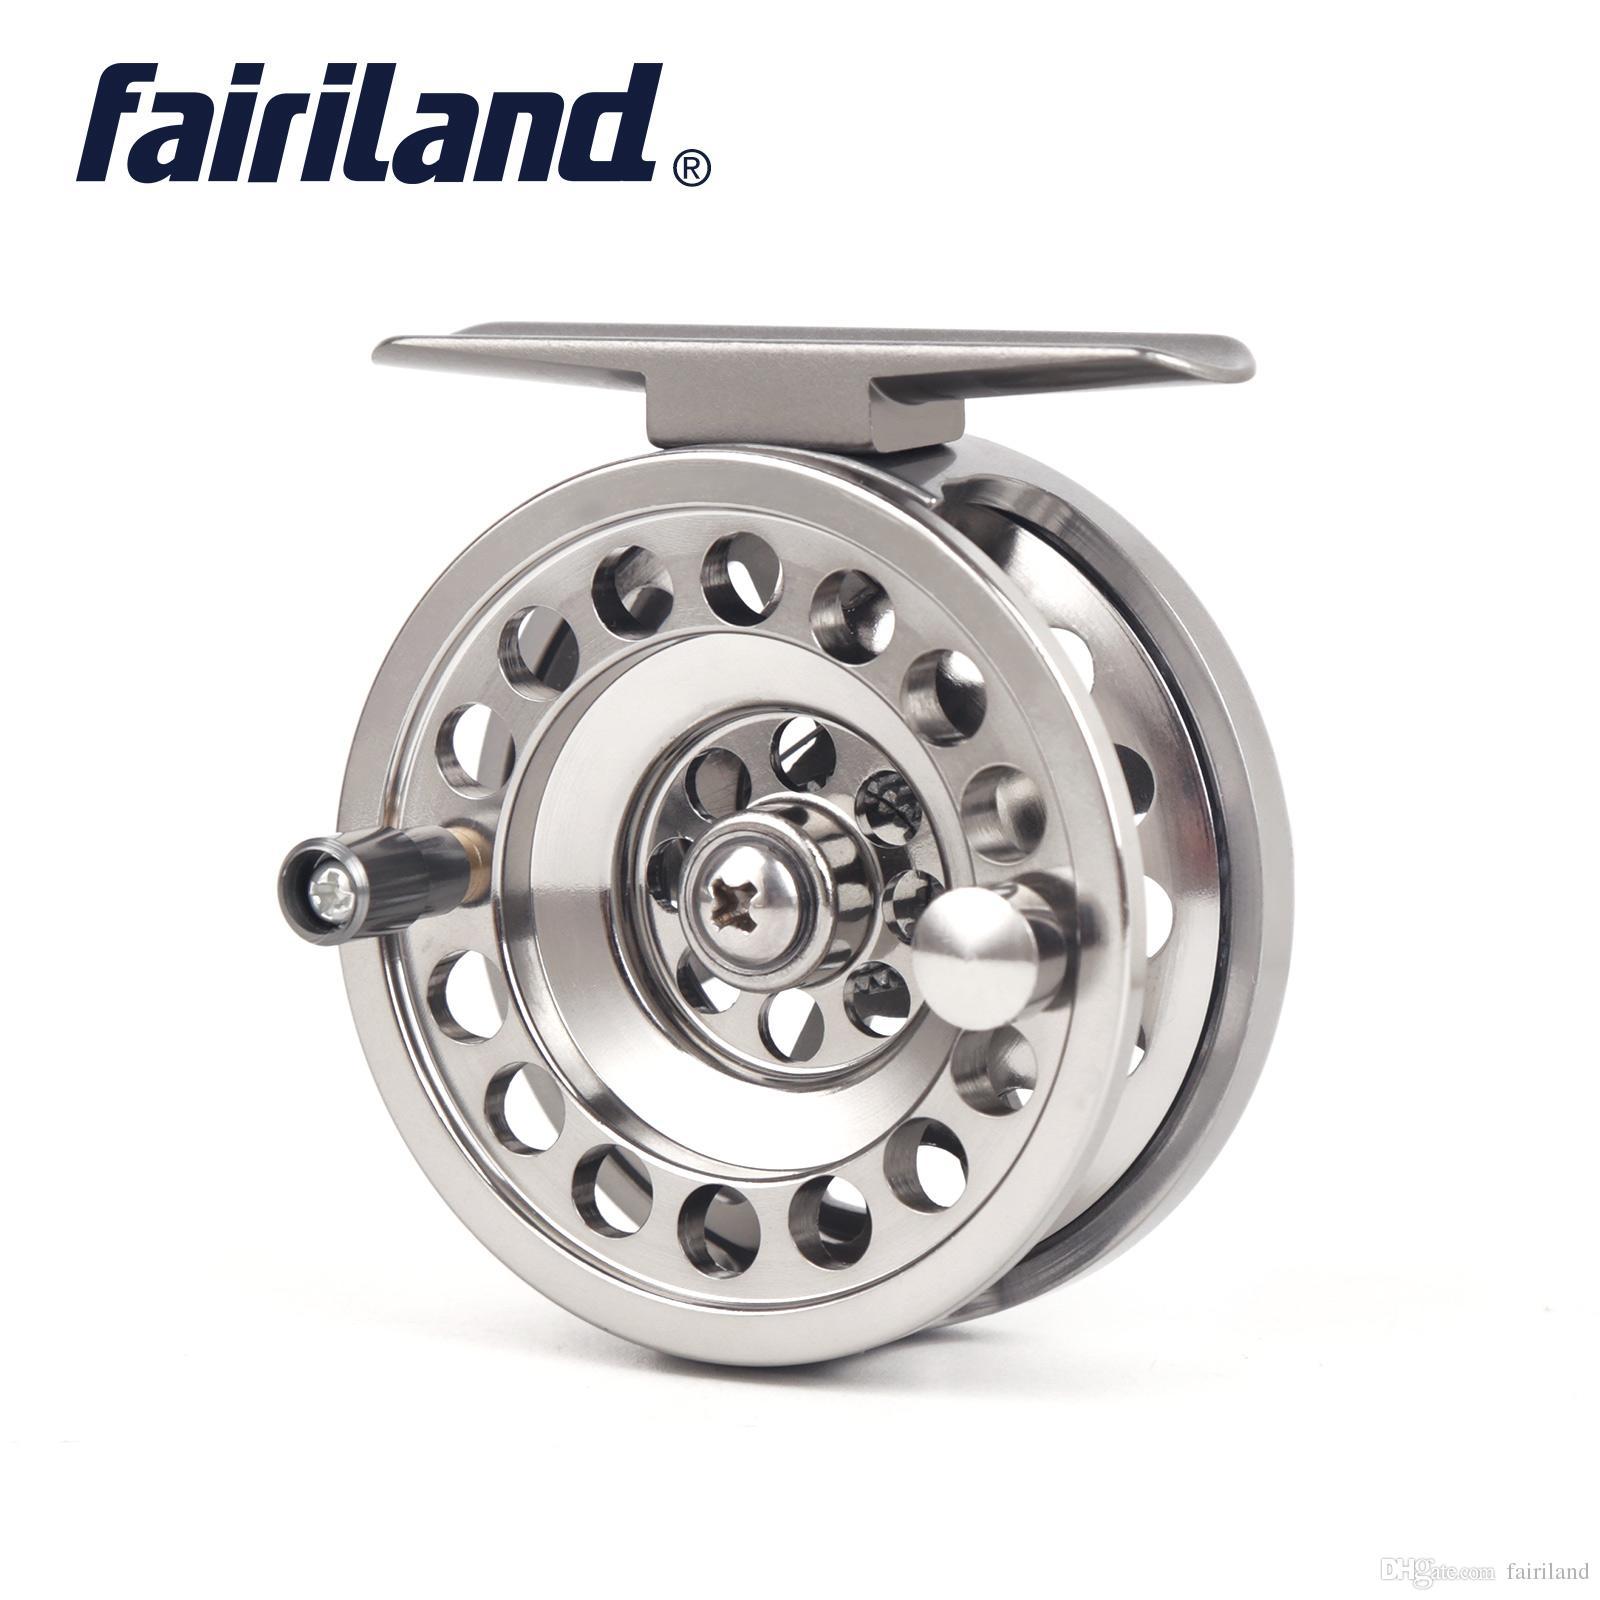 2018 Nueva Llegada Carrete de Pesca en Hielo Fairiland 2BB + RBB Carretes de pesca de aluminio 1: 1 Full Left / Right Handed Ice Fishing Wheel carrete de la mosca